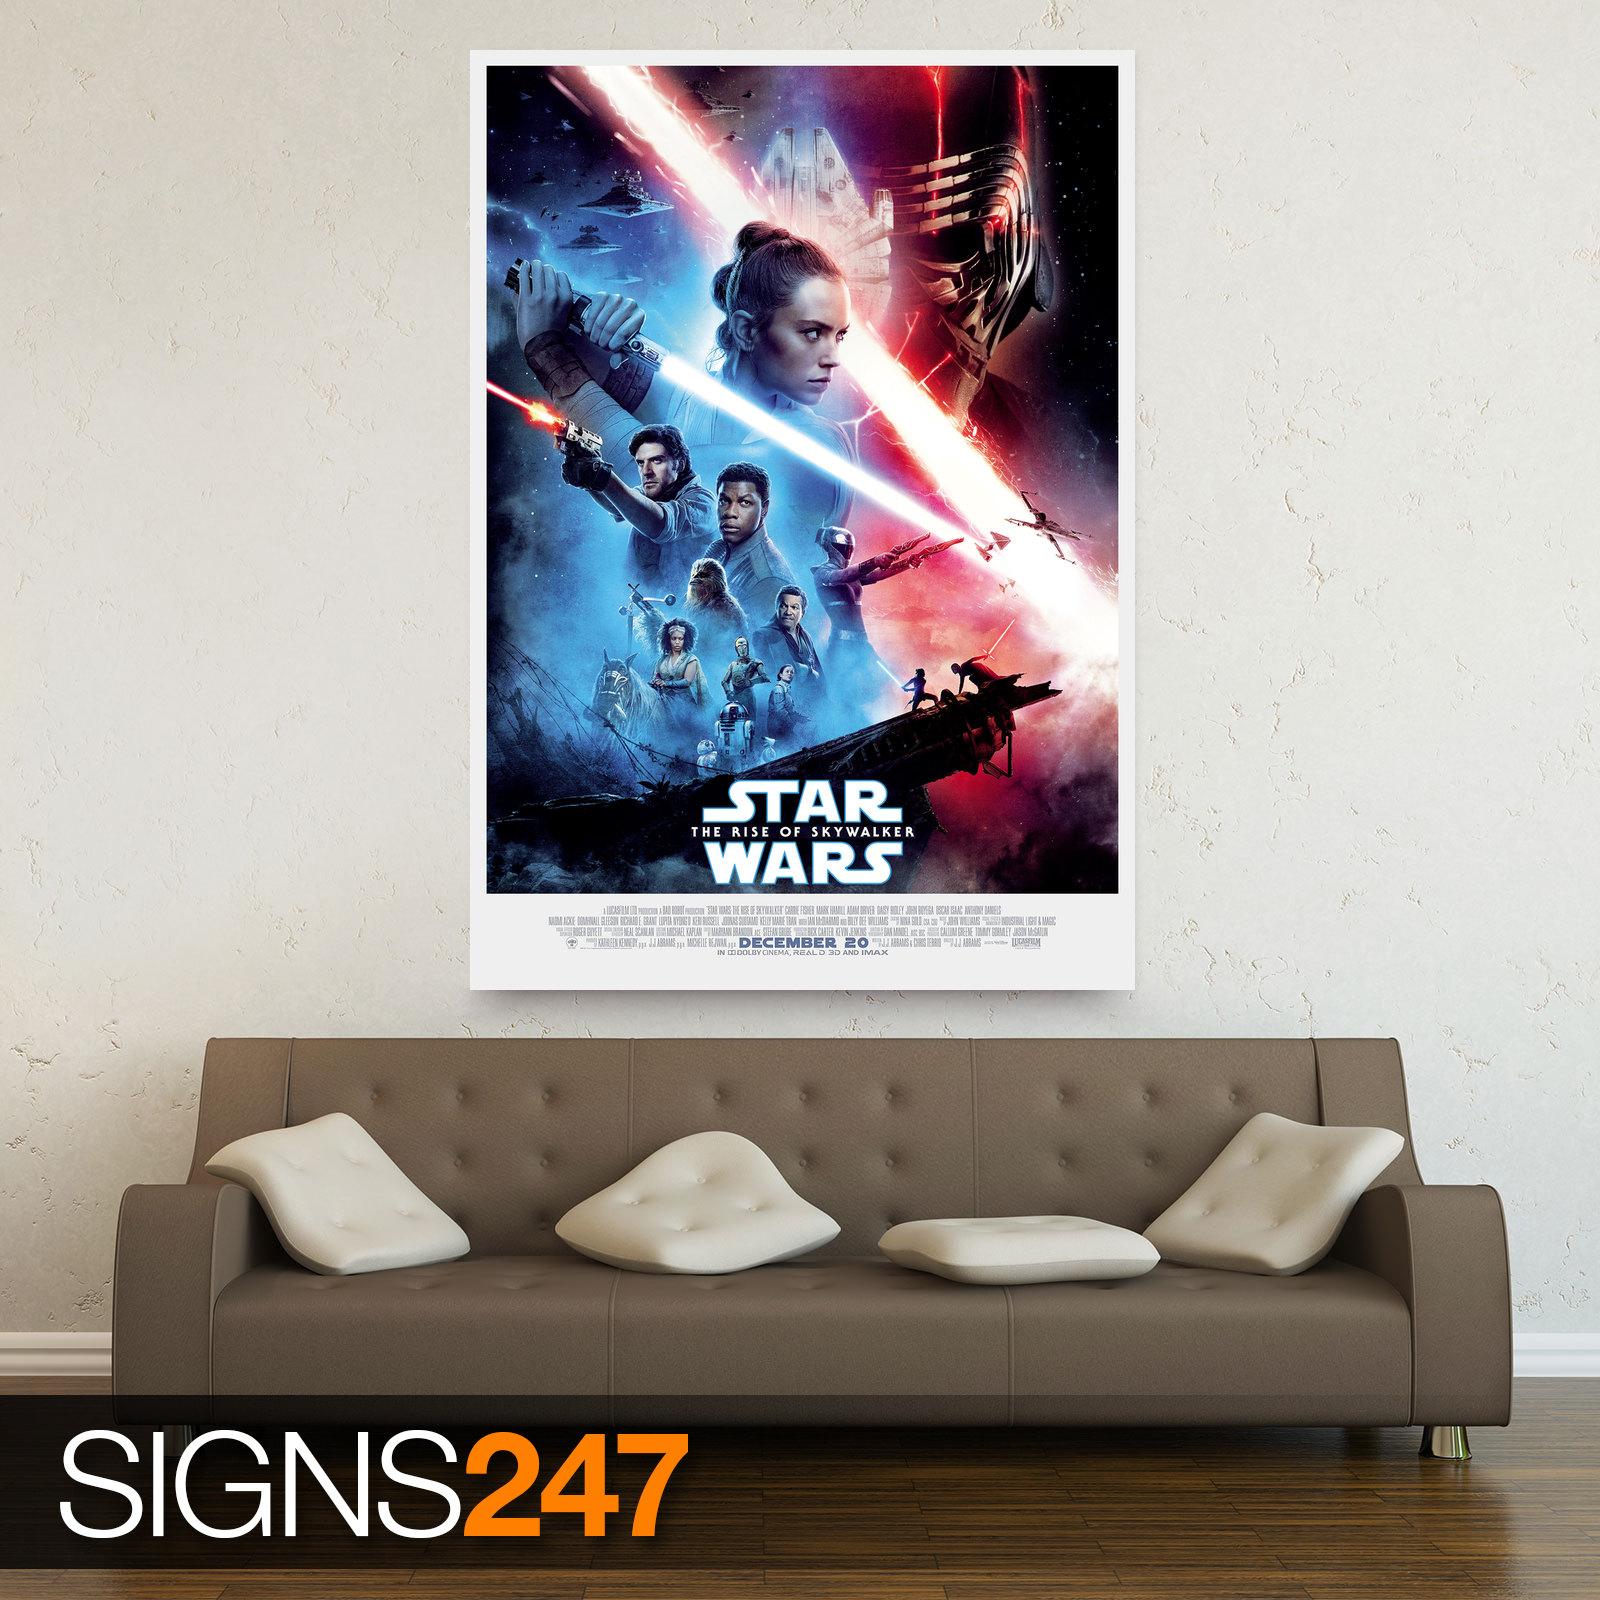 STAR-WARS-RISE-OF-SKYWALKER-POSTER-ZZ082-MOVIE-POSTER-Photo-Poster-Print-Art thumbnail 2